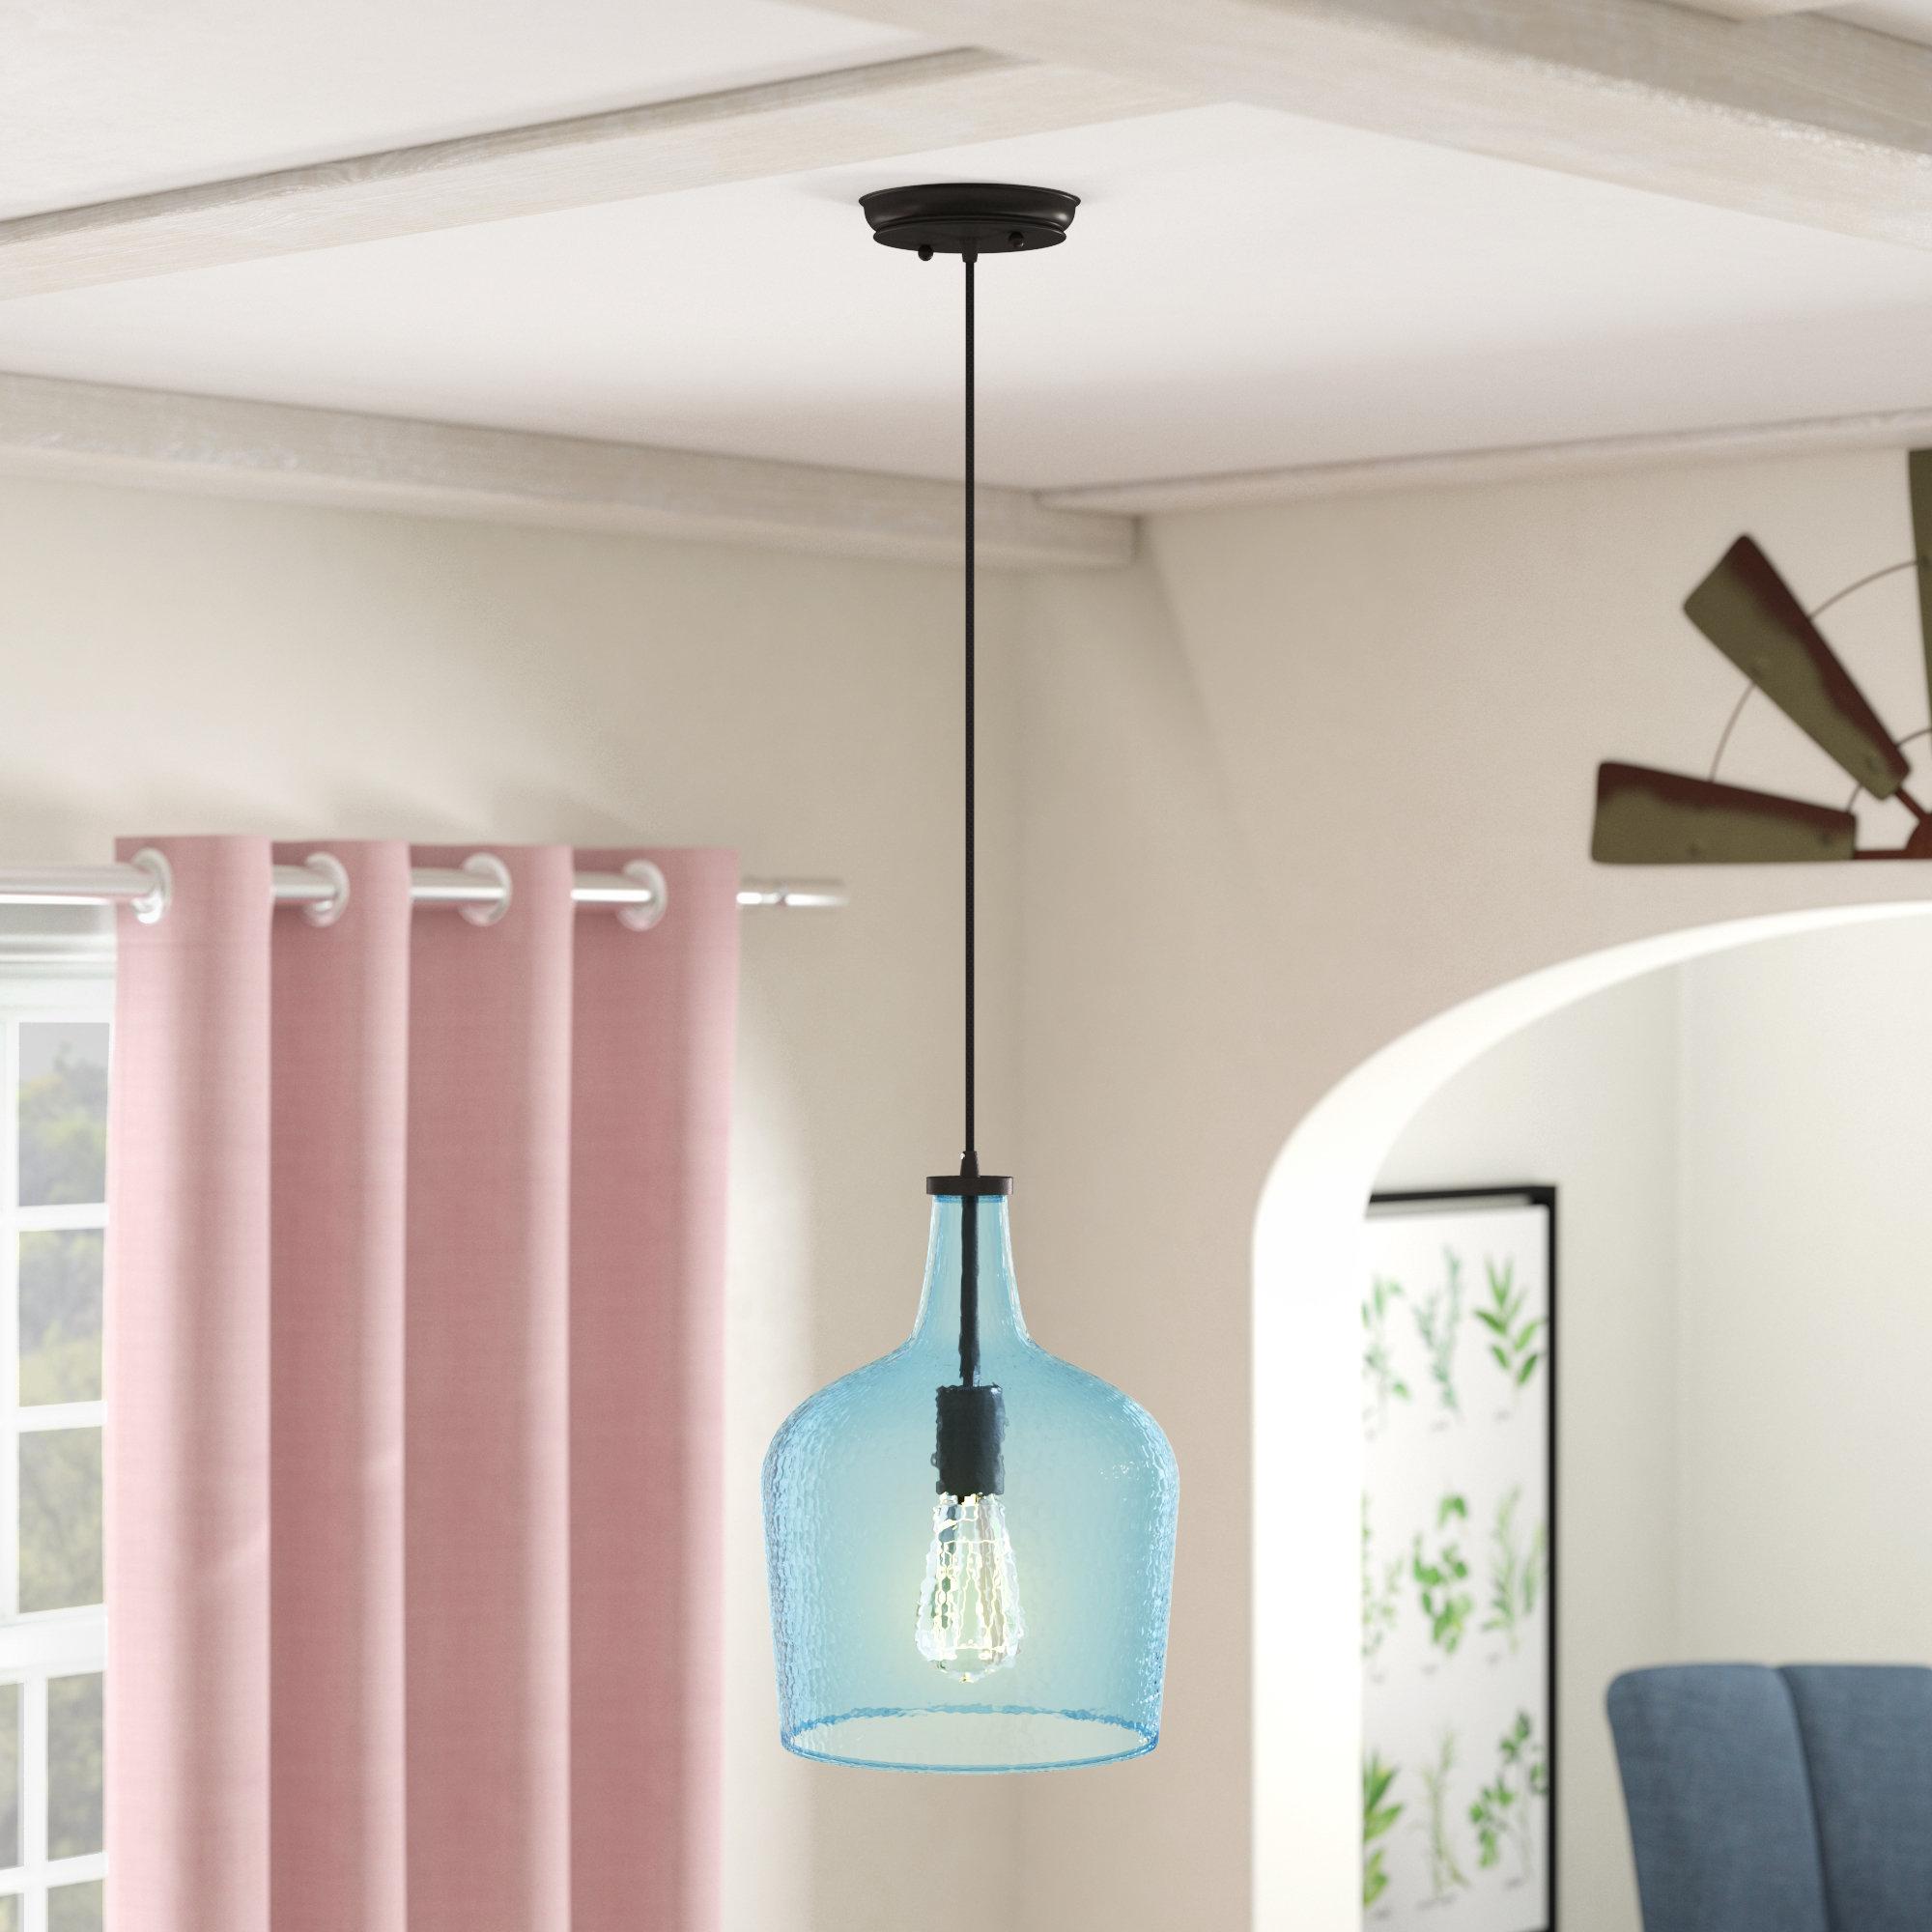 1 Light Single Bell Pendants Throughout Favorite Scruggs 1 Light Single Bell Pendant (View 11 of 25)